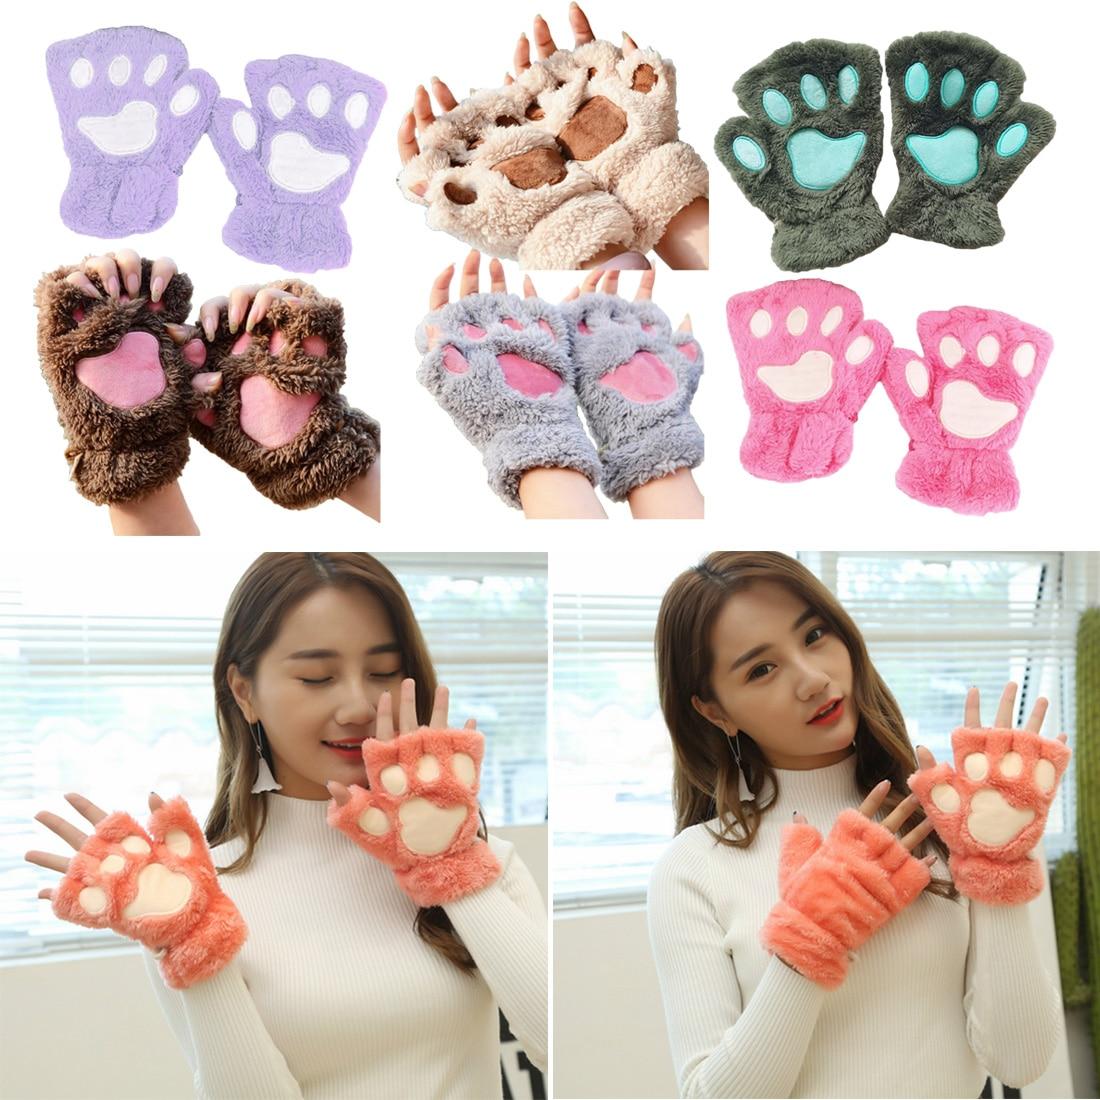 2018 Winter Schöne Bär Katze Klaue Pfote Handschuh Plüsch Frauen Handschuhe Kurz Finger Halb Handschuhe Damen Halb Abdeckung Weibliche Handschuhe